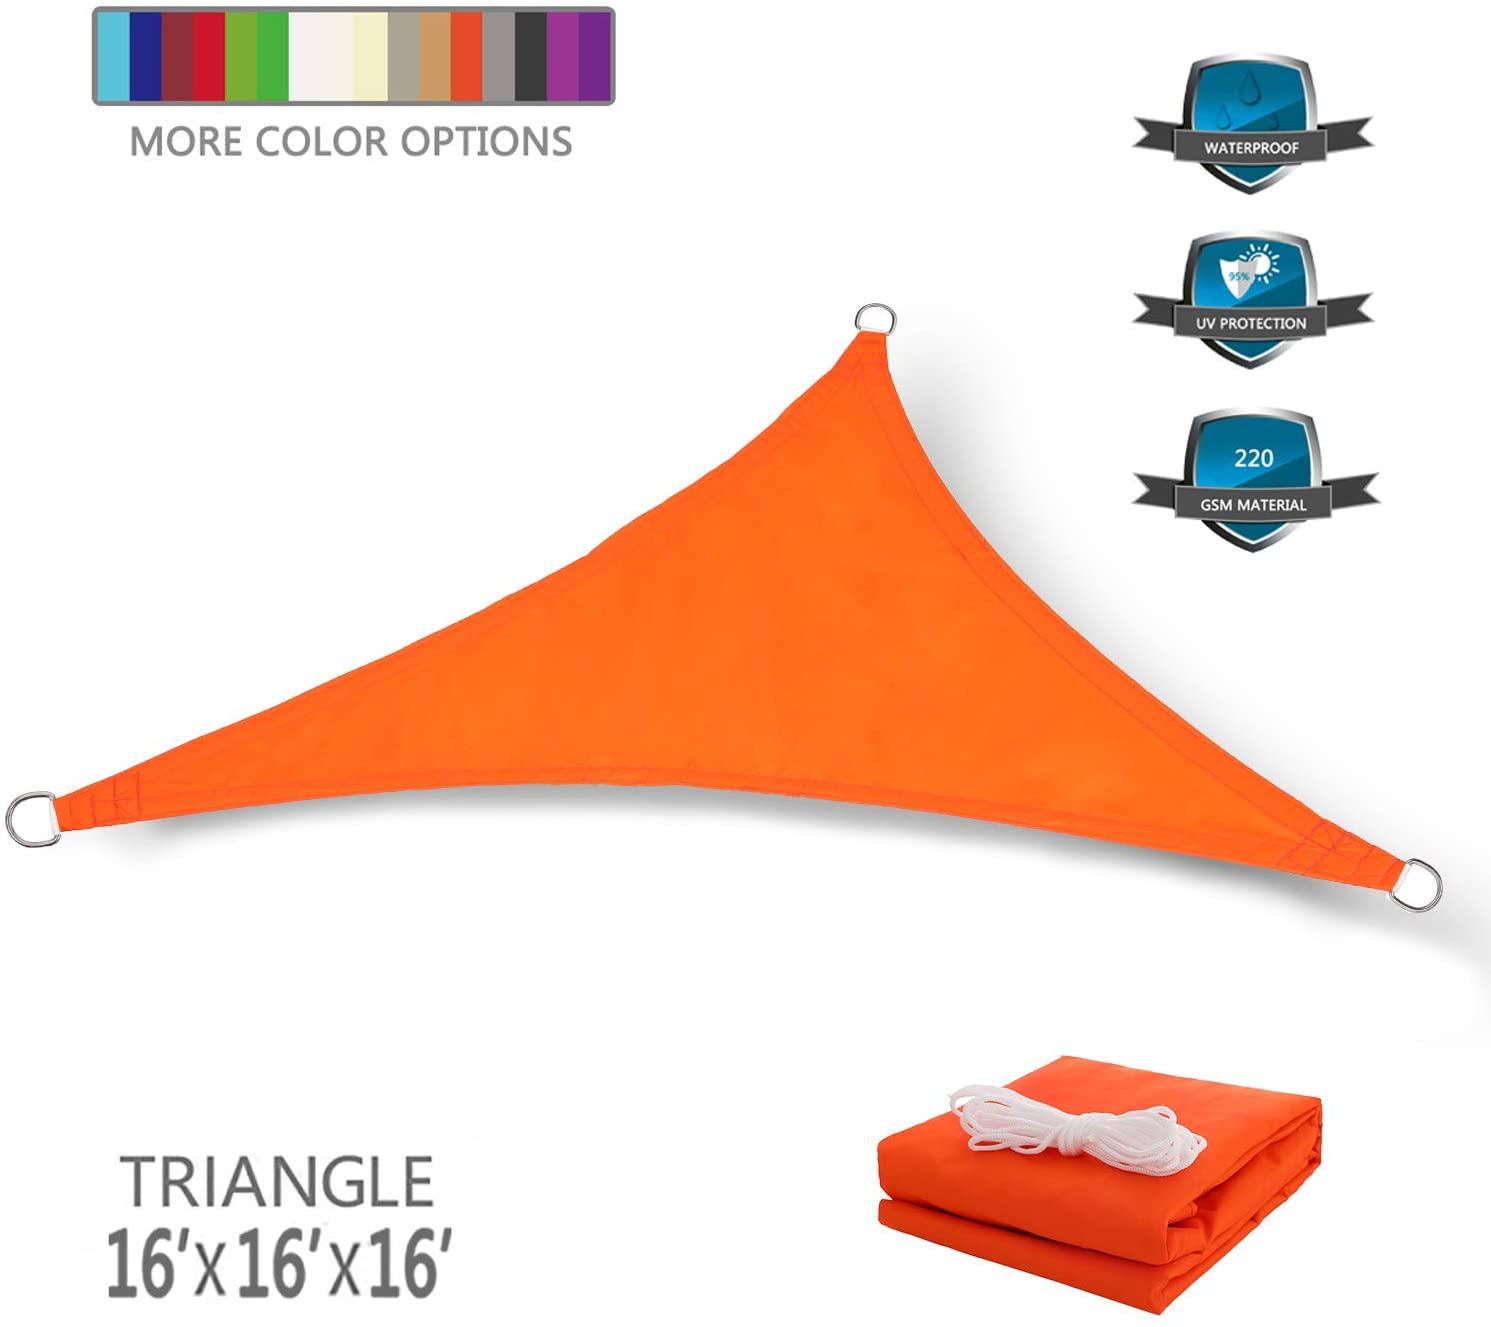 Tuosite Terylene Waterproof Sun Shade Sail UV Blocker Sunshade Patio Equilateral Triangle Knitted 220 GSM Block Fabric Pergola Carport Awning 16' x 16' x 16' in Color Orange